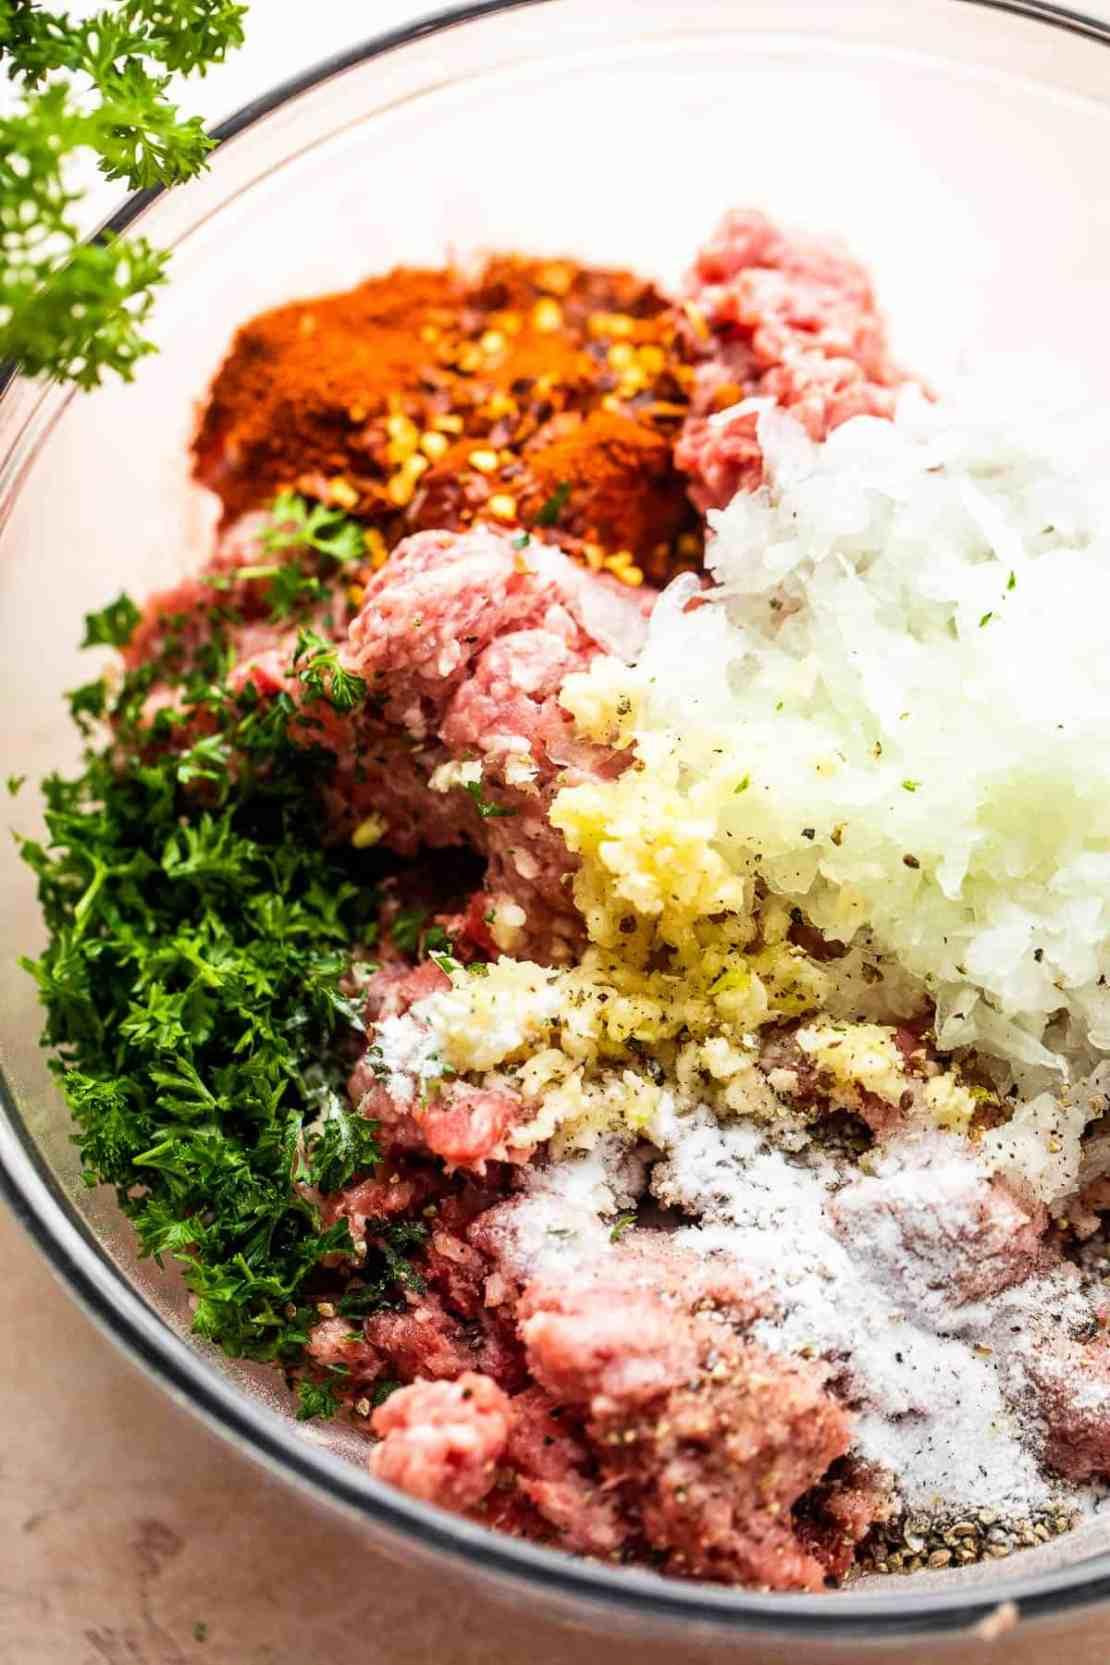 kebapi meat mixture